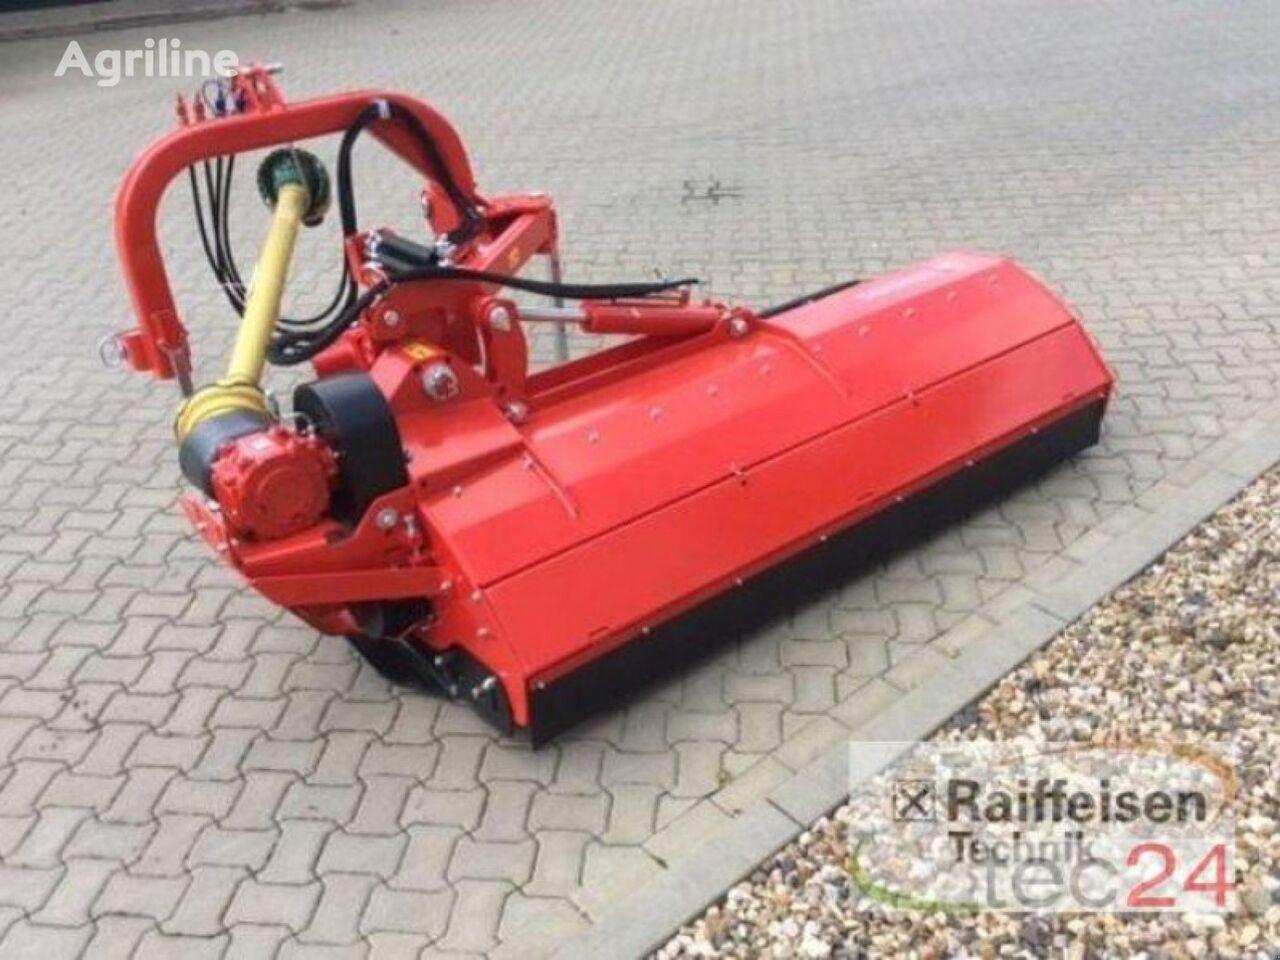 new TEHNOS MB 220 Profi LW tractor mulcher